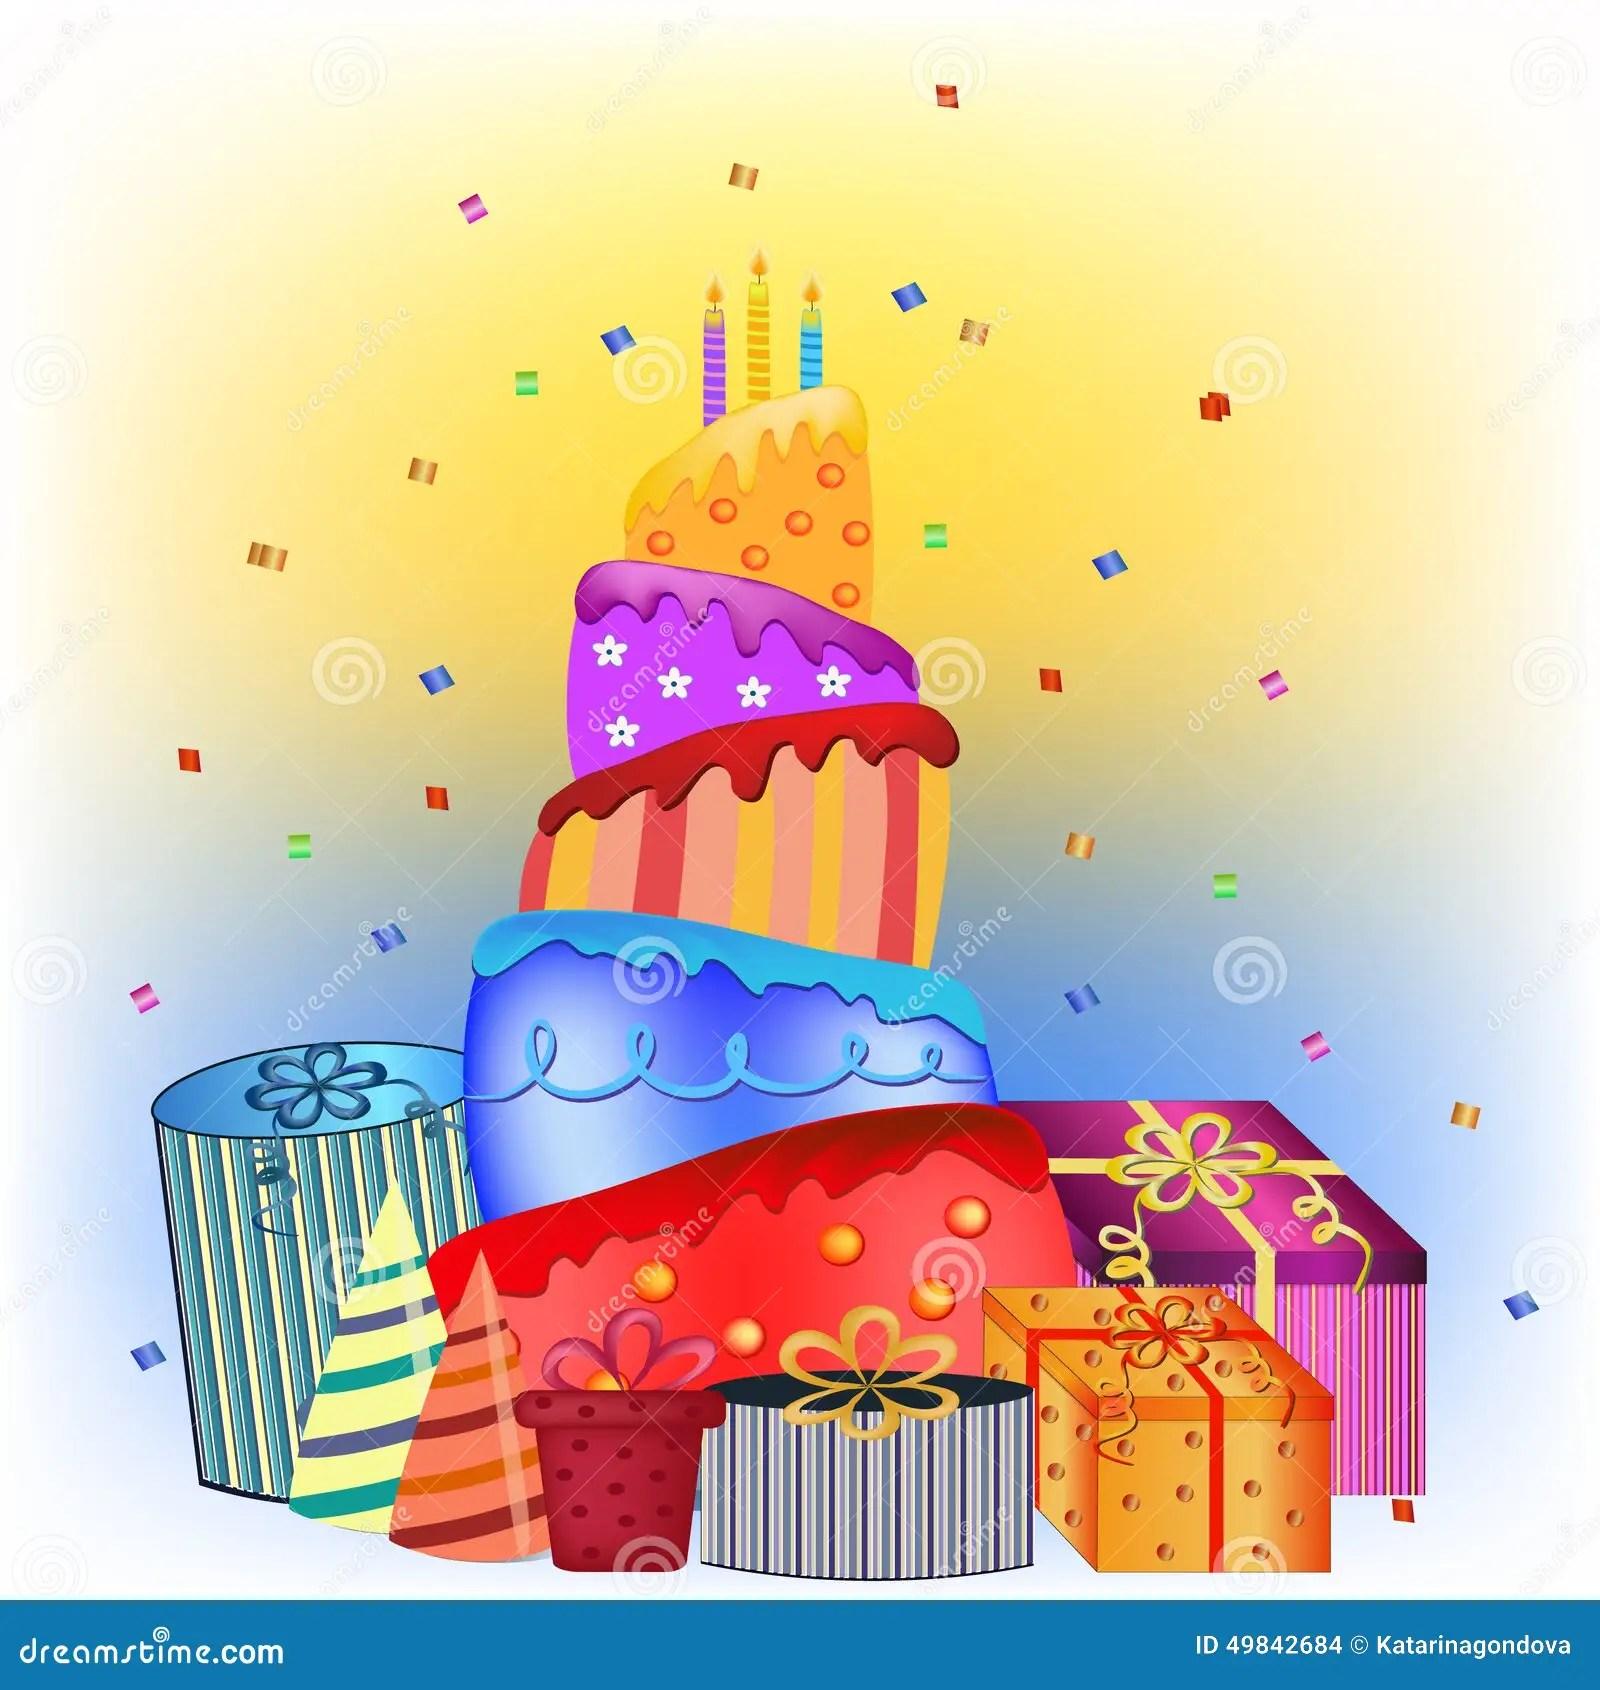 Happy Birthday Cake And Presents Stock Vector Illustration Of Happy Cake 49842684